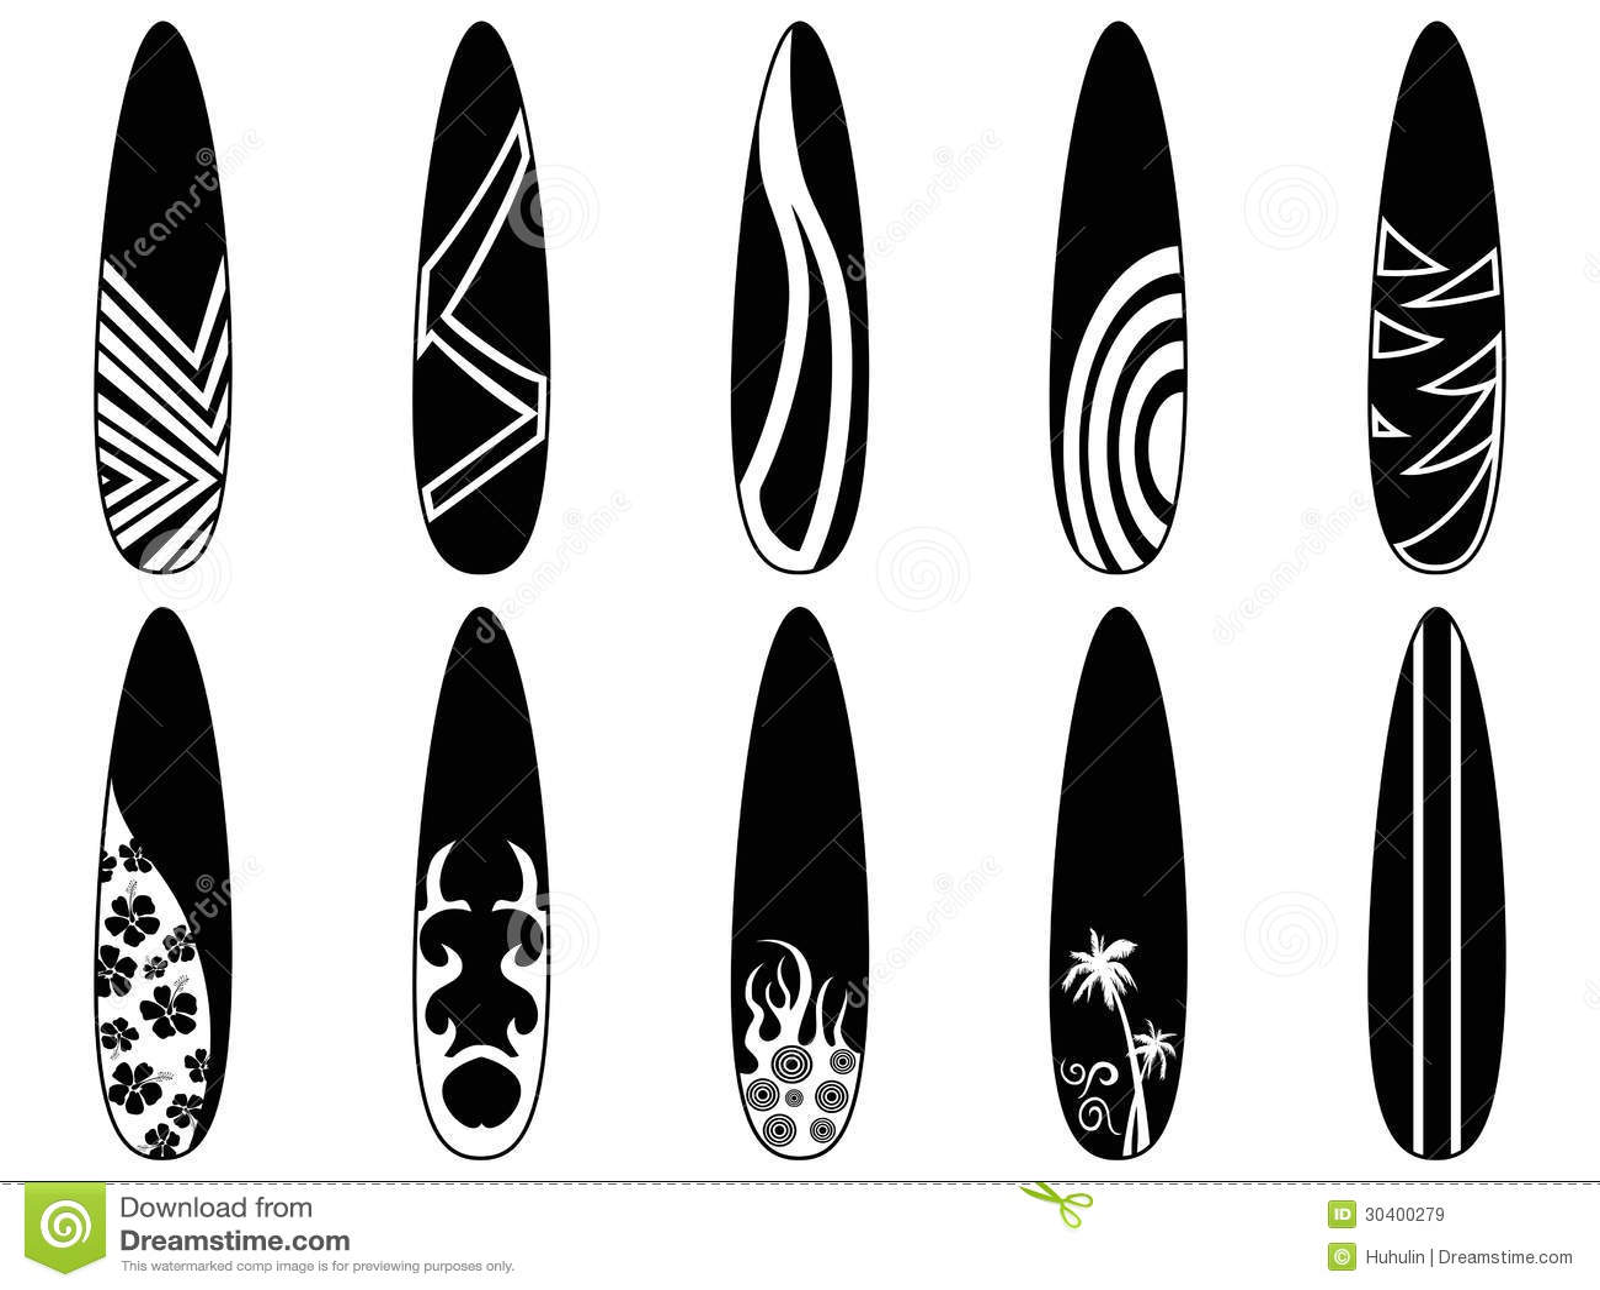 Surfboard Icons Stock Vector Illustration Of Black